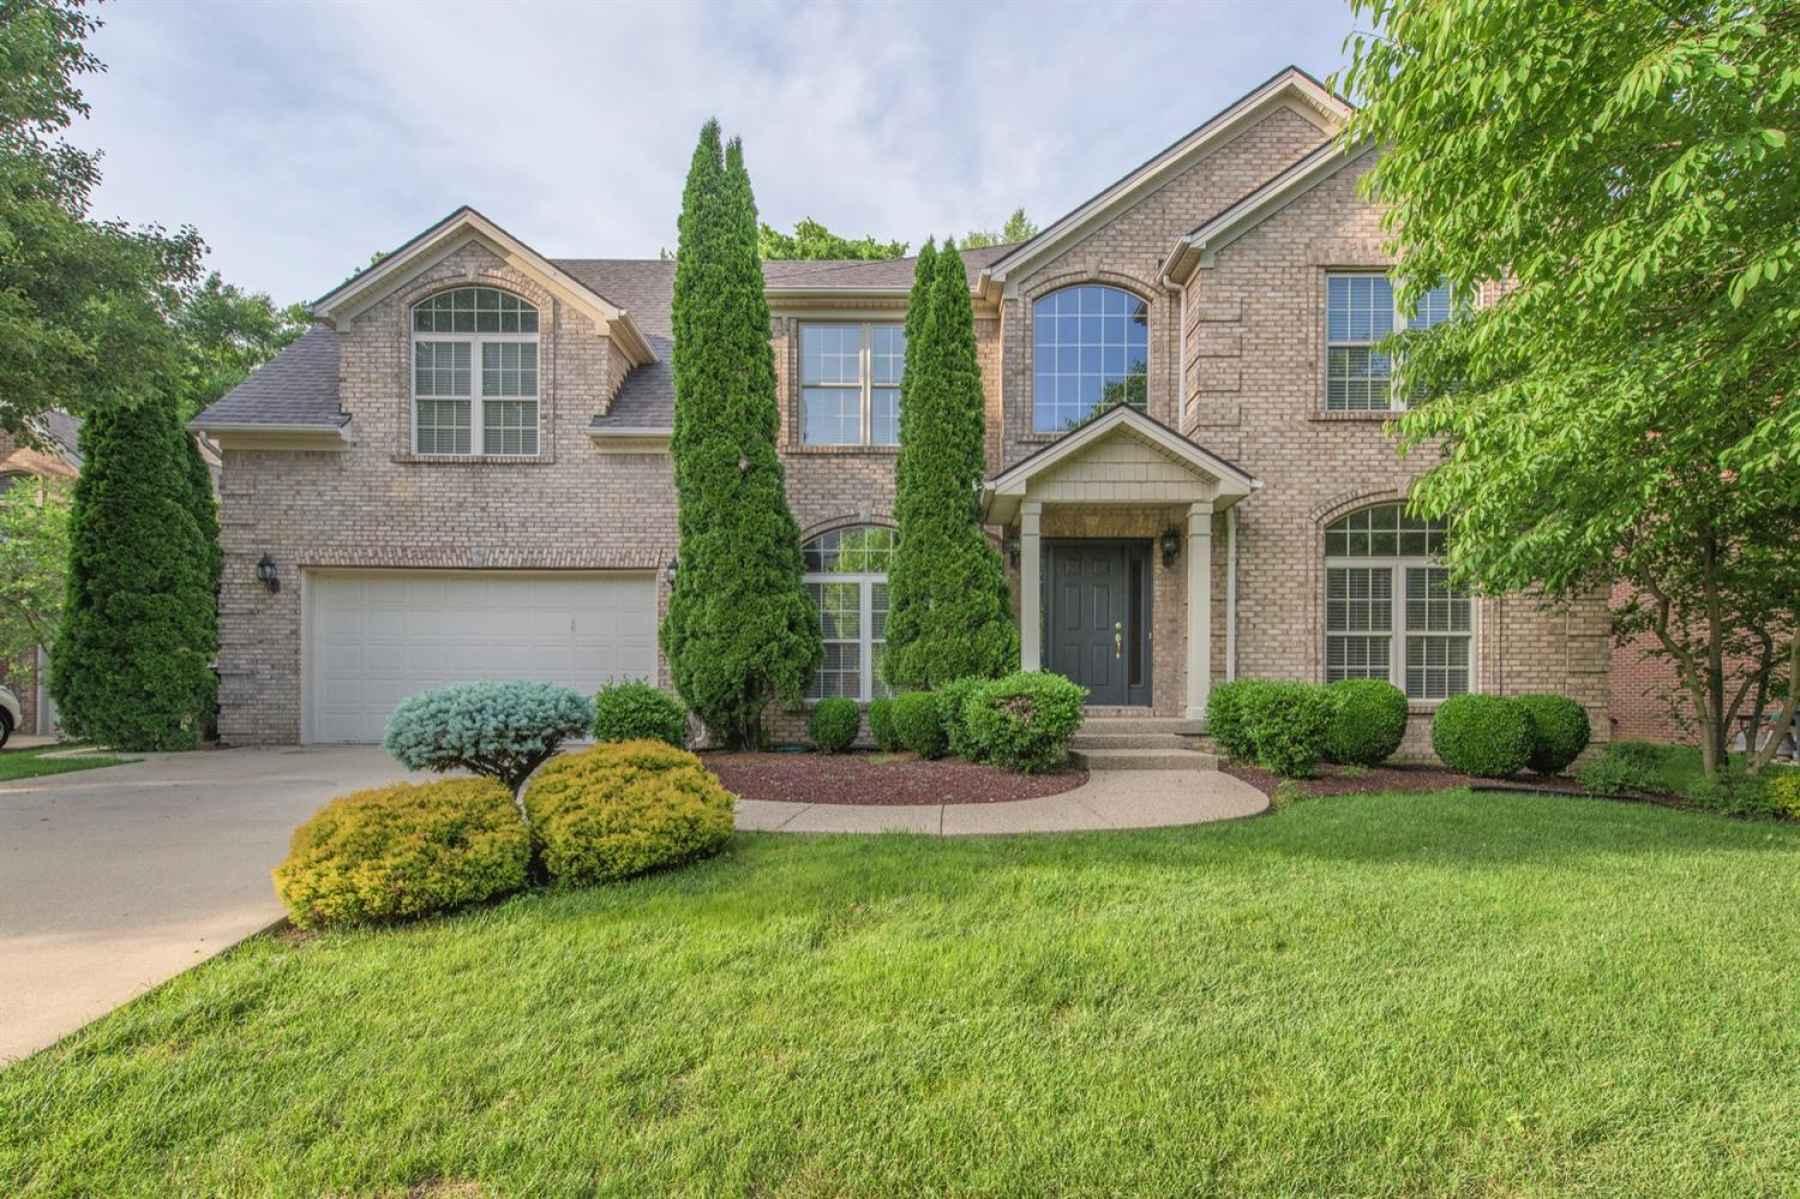 Remarkable 2148 Carolina Lane Lexington Ky 40513 Download Free Architecture Designs Scobabritishbridgeorg